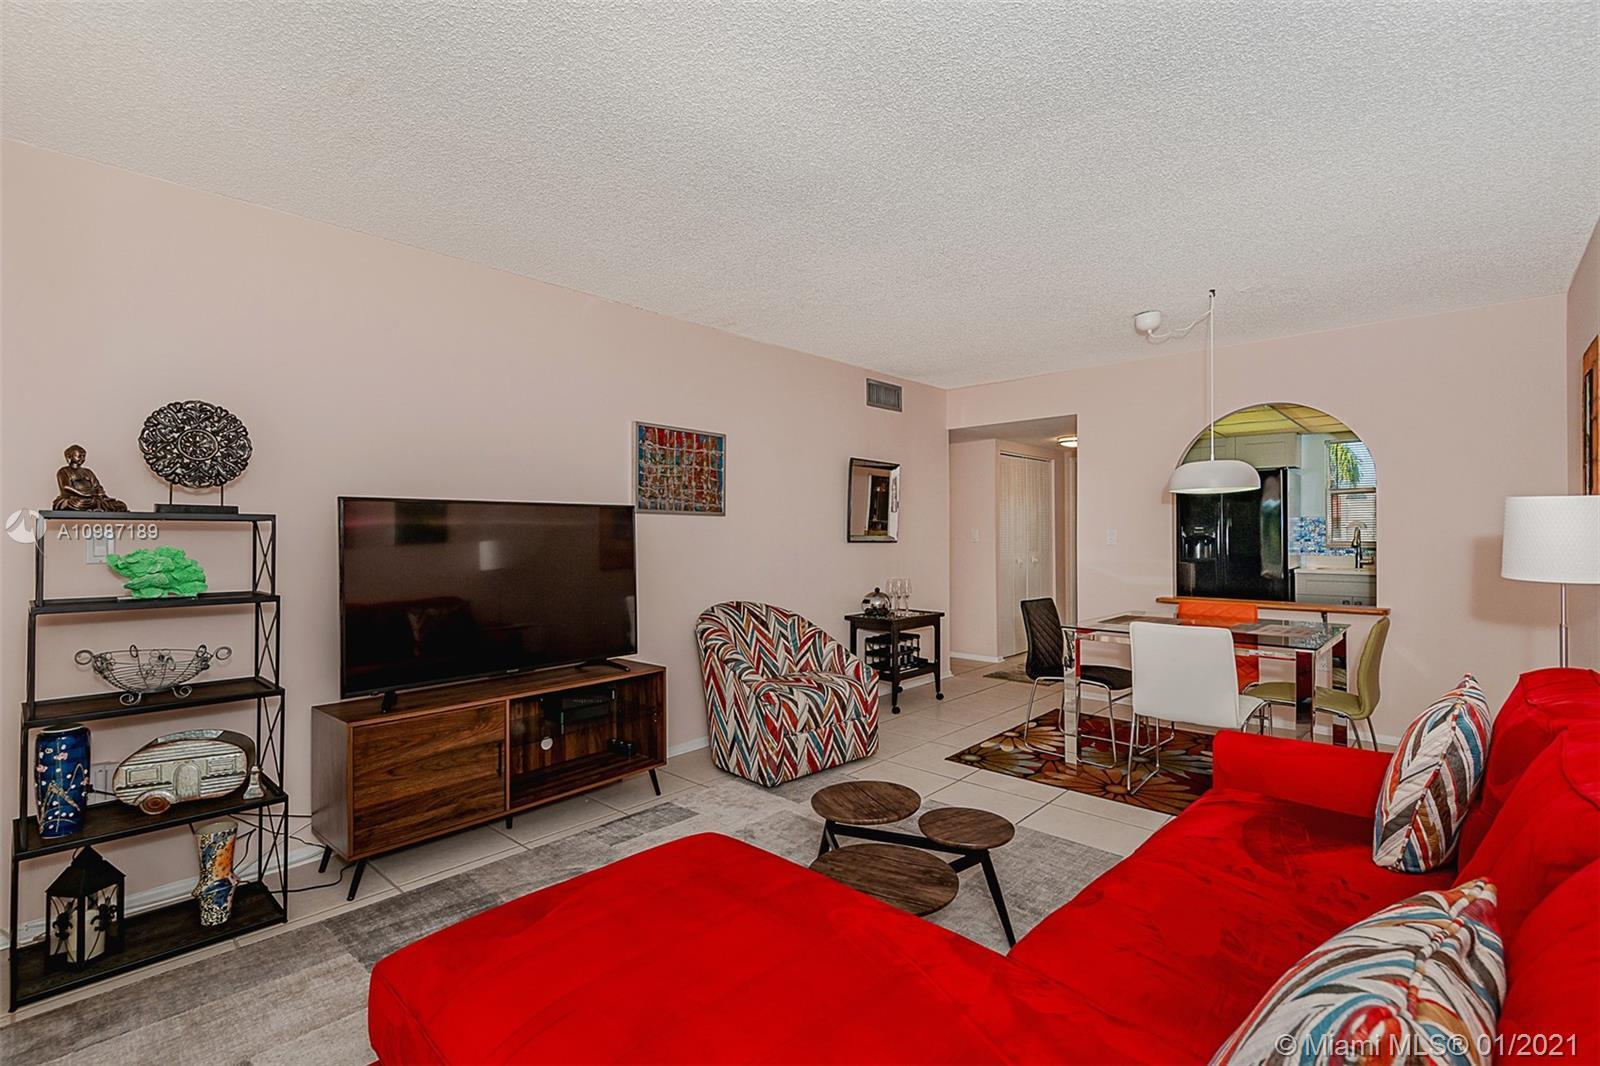 3091 E Sunrise Lakes Dr # 308, Sunrise, Florida 33322, 1 Bedroom Bedrooms, ,1 BathroomBathrooms,Residential,For Sale,3091 E Sunrise Lakes Dr # 308,A10987189